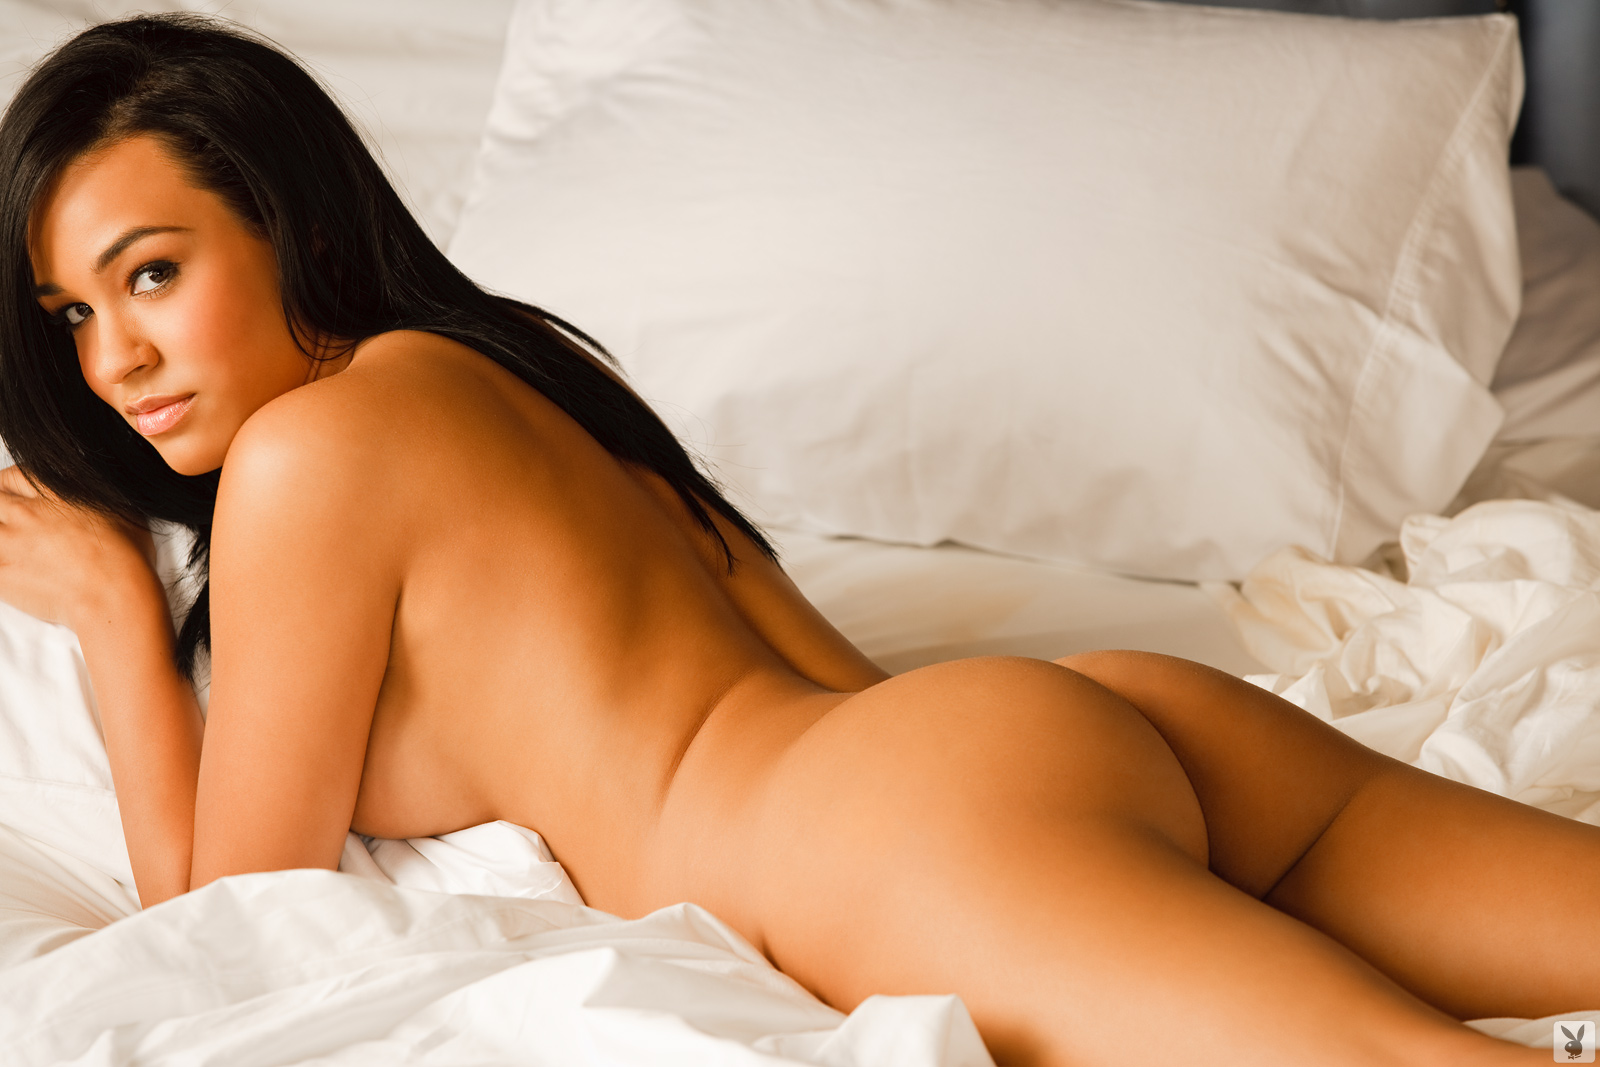 Andrea Leilani, brunette, strip, lingerie, bed